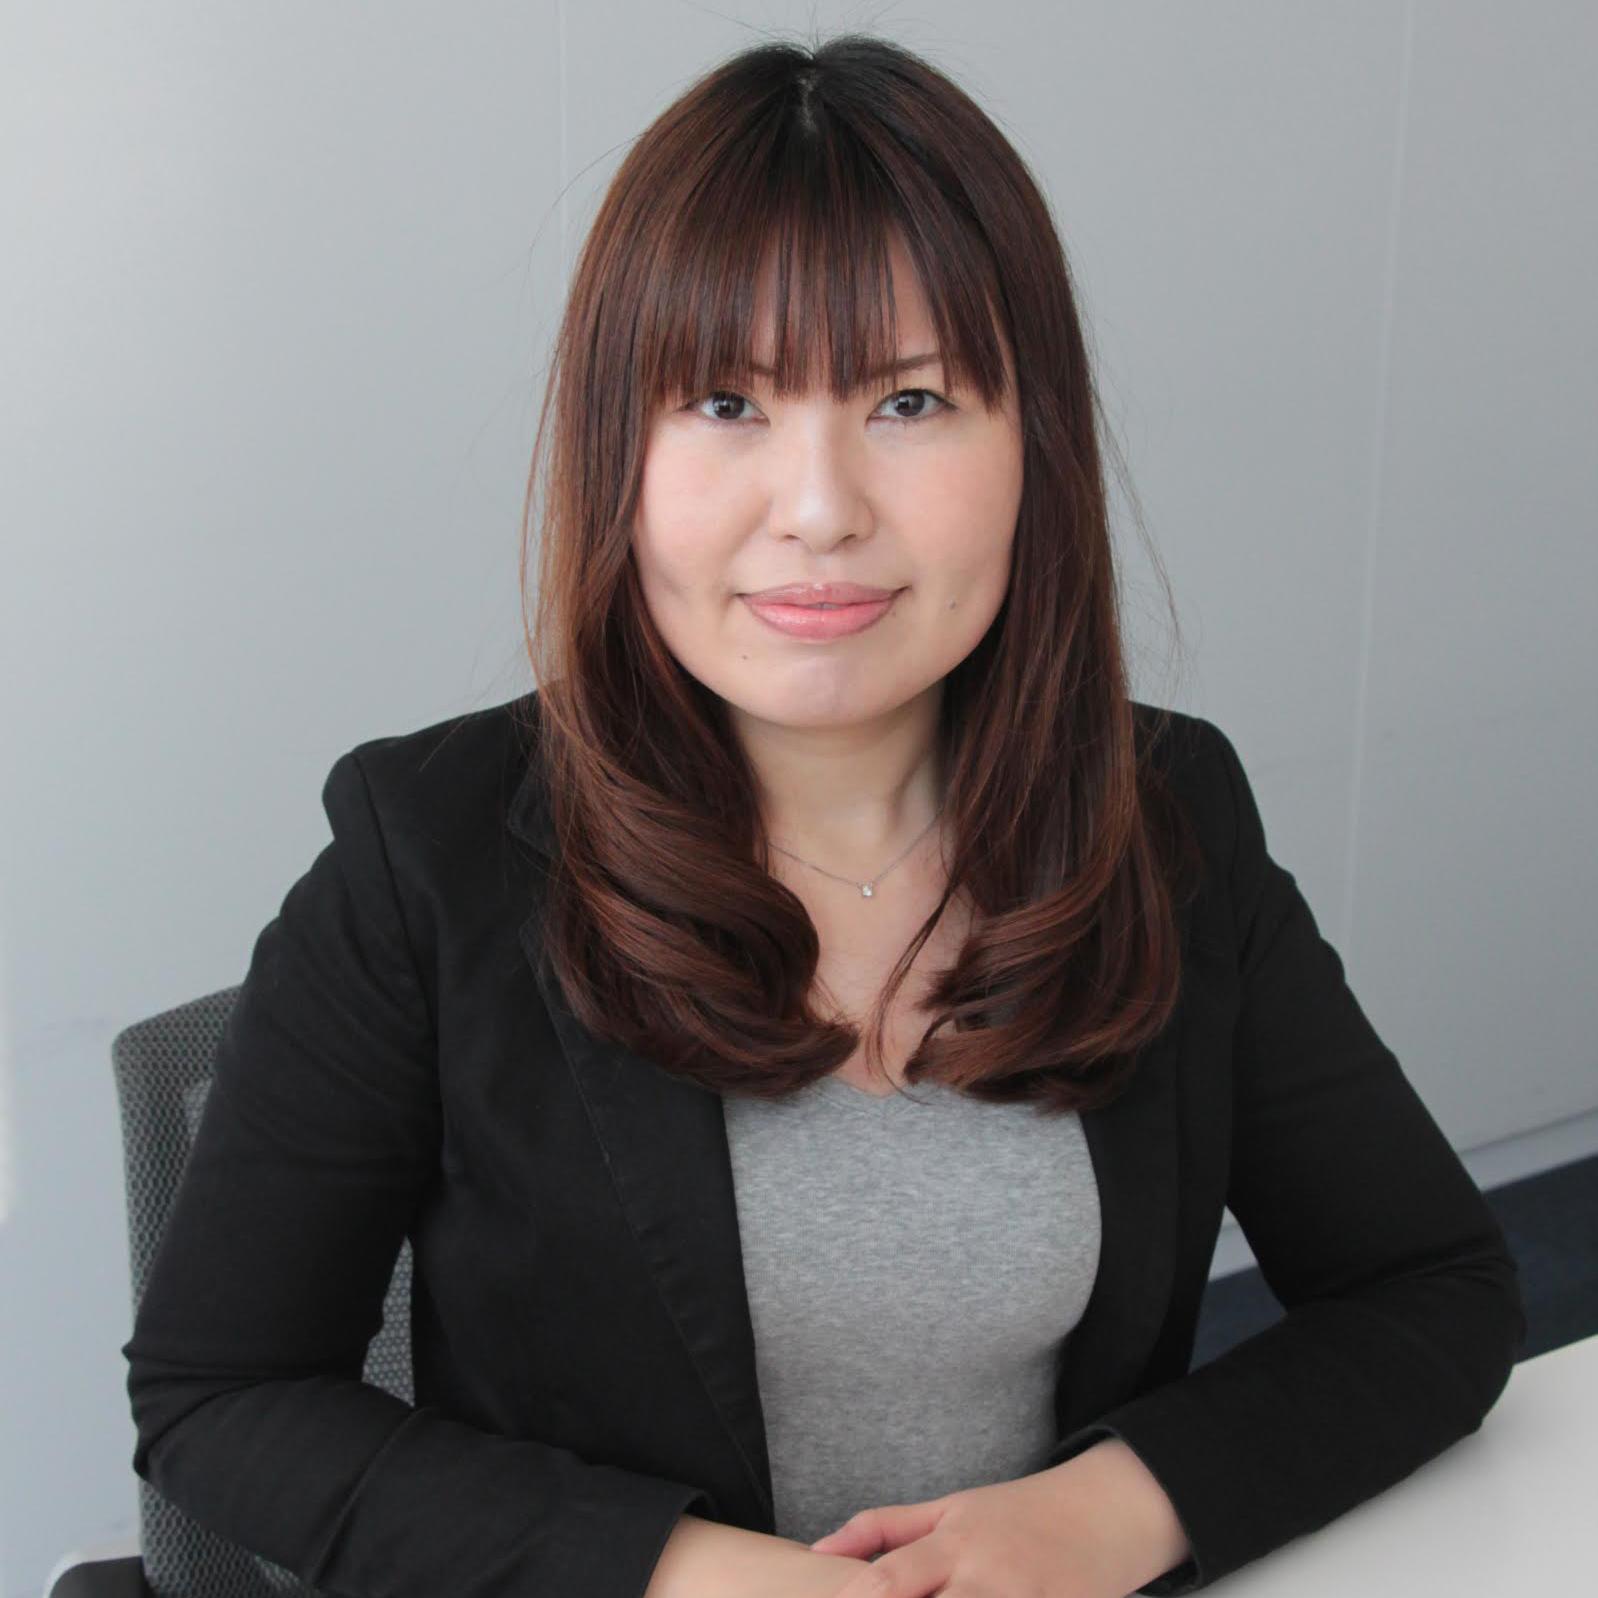 Yuki Kunisawa